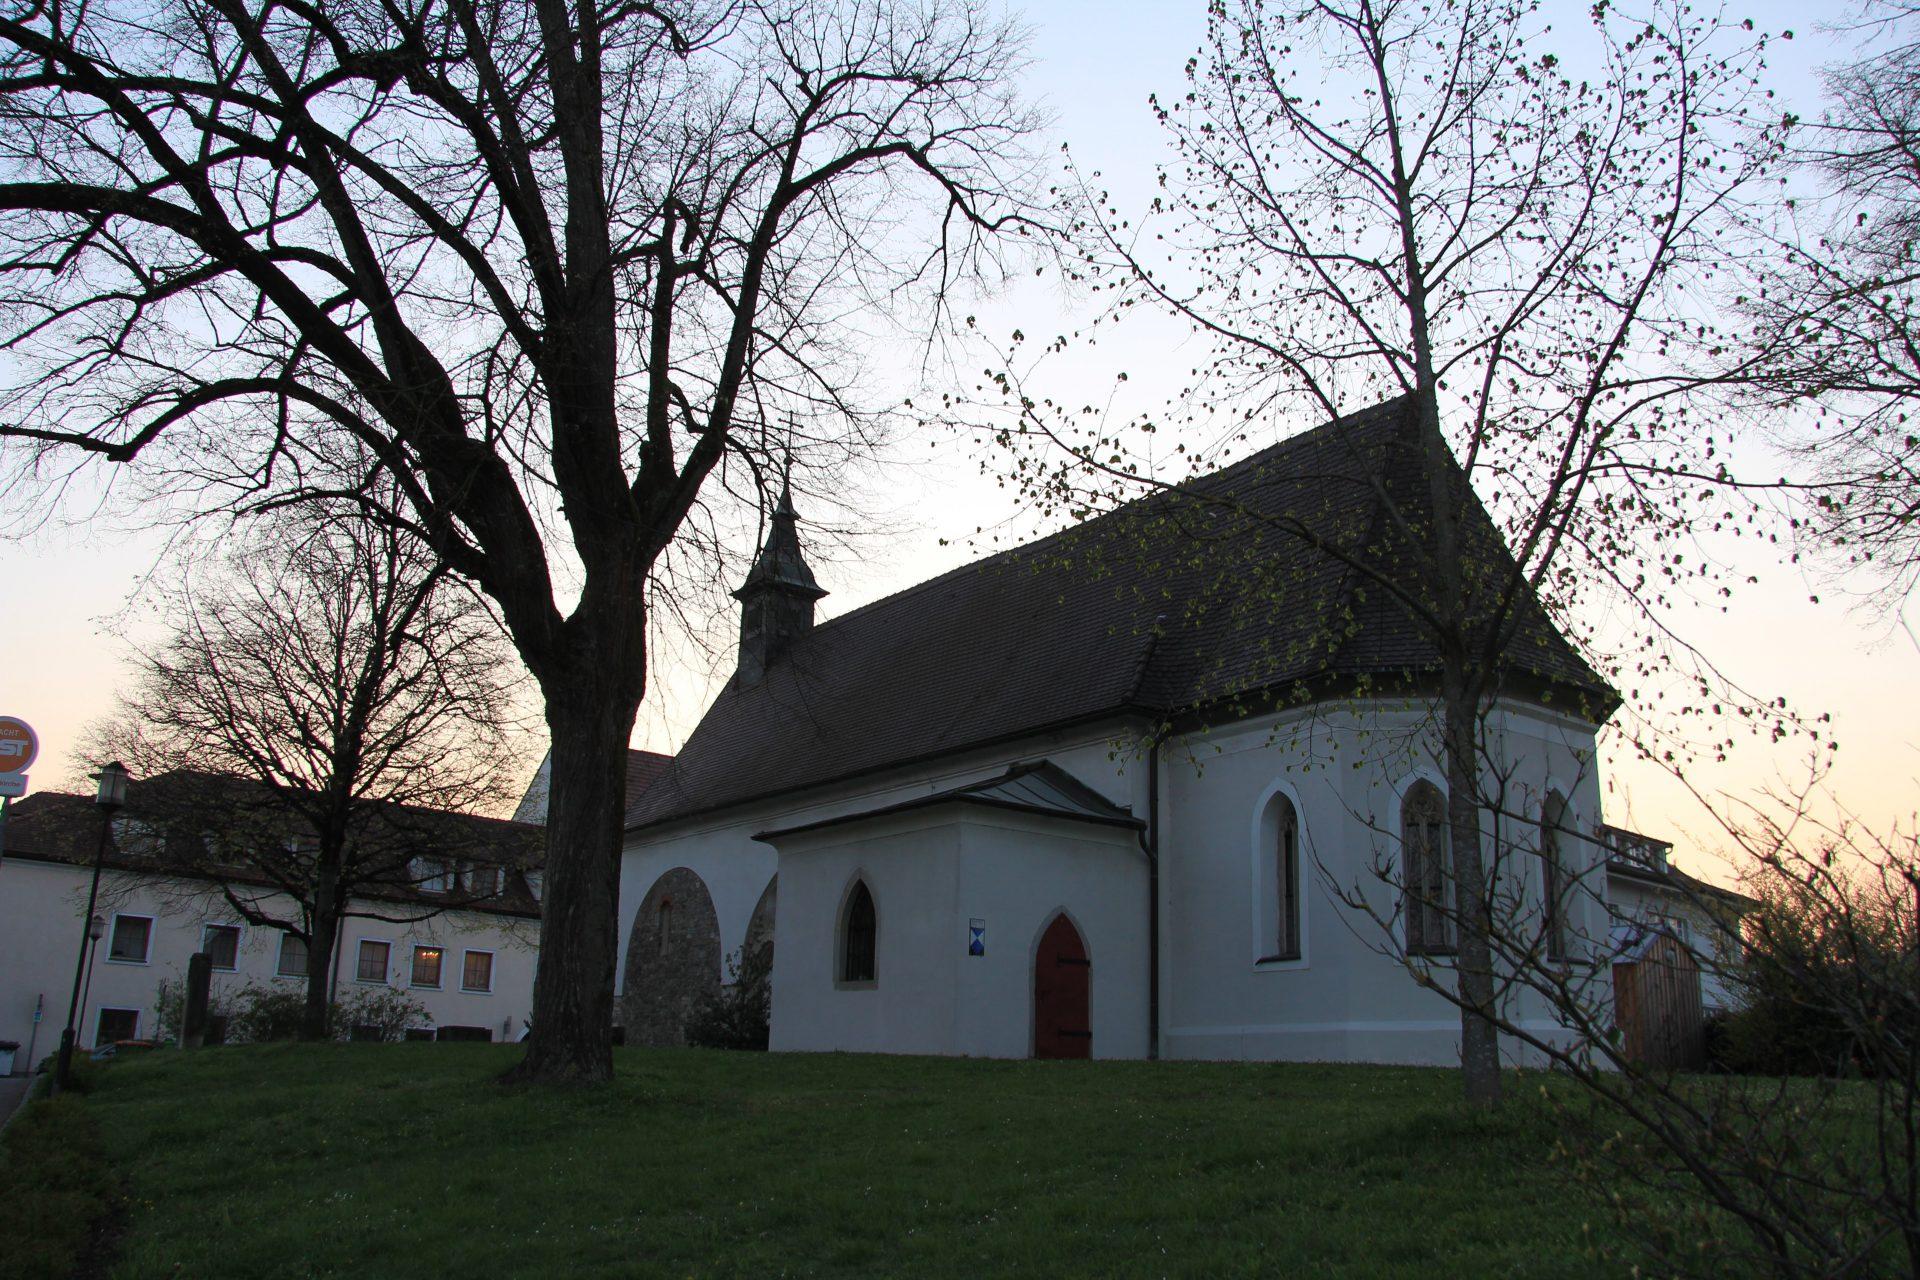 Martinskirche. Церковь Святого Мартина в Линце